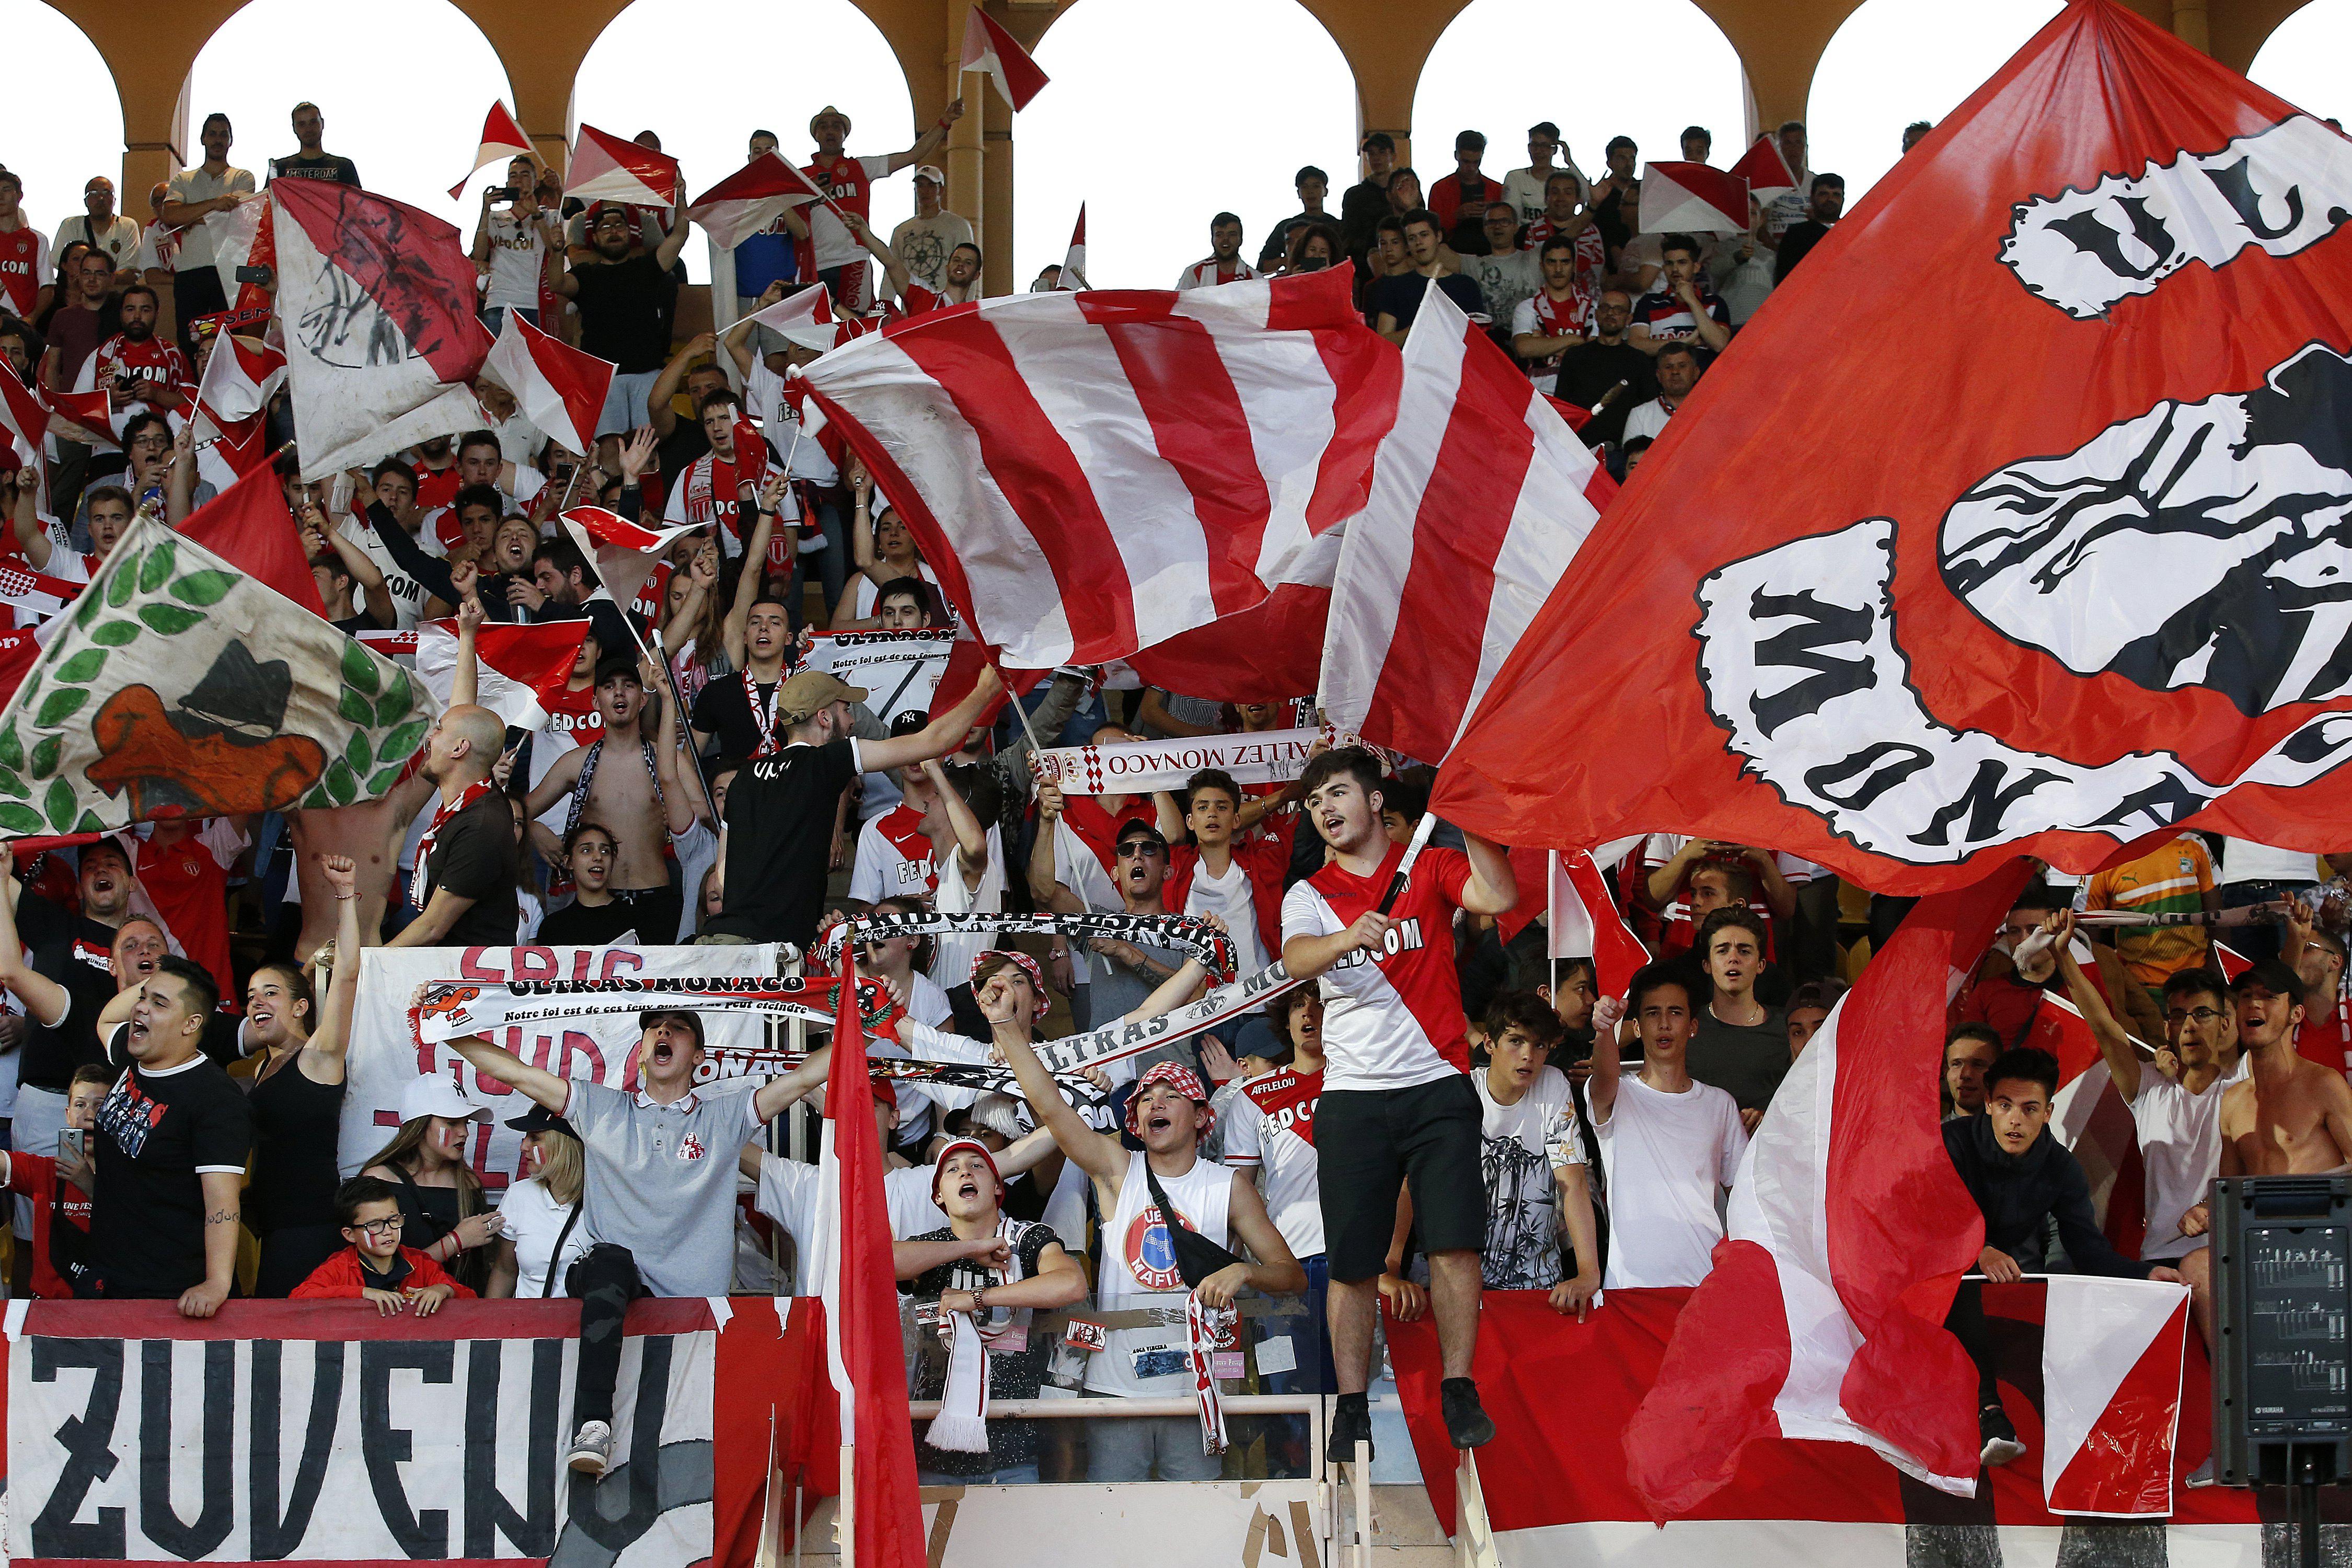 Monaco won their first Ligue 1 title since 1999-2000 last season